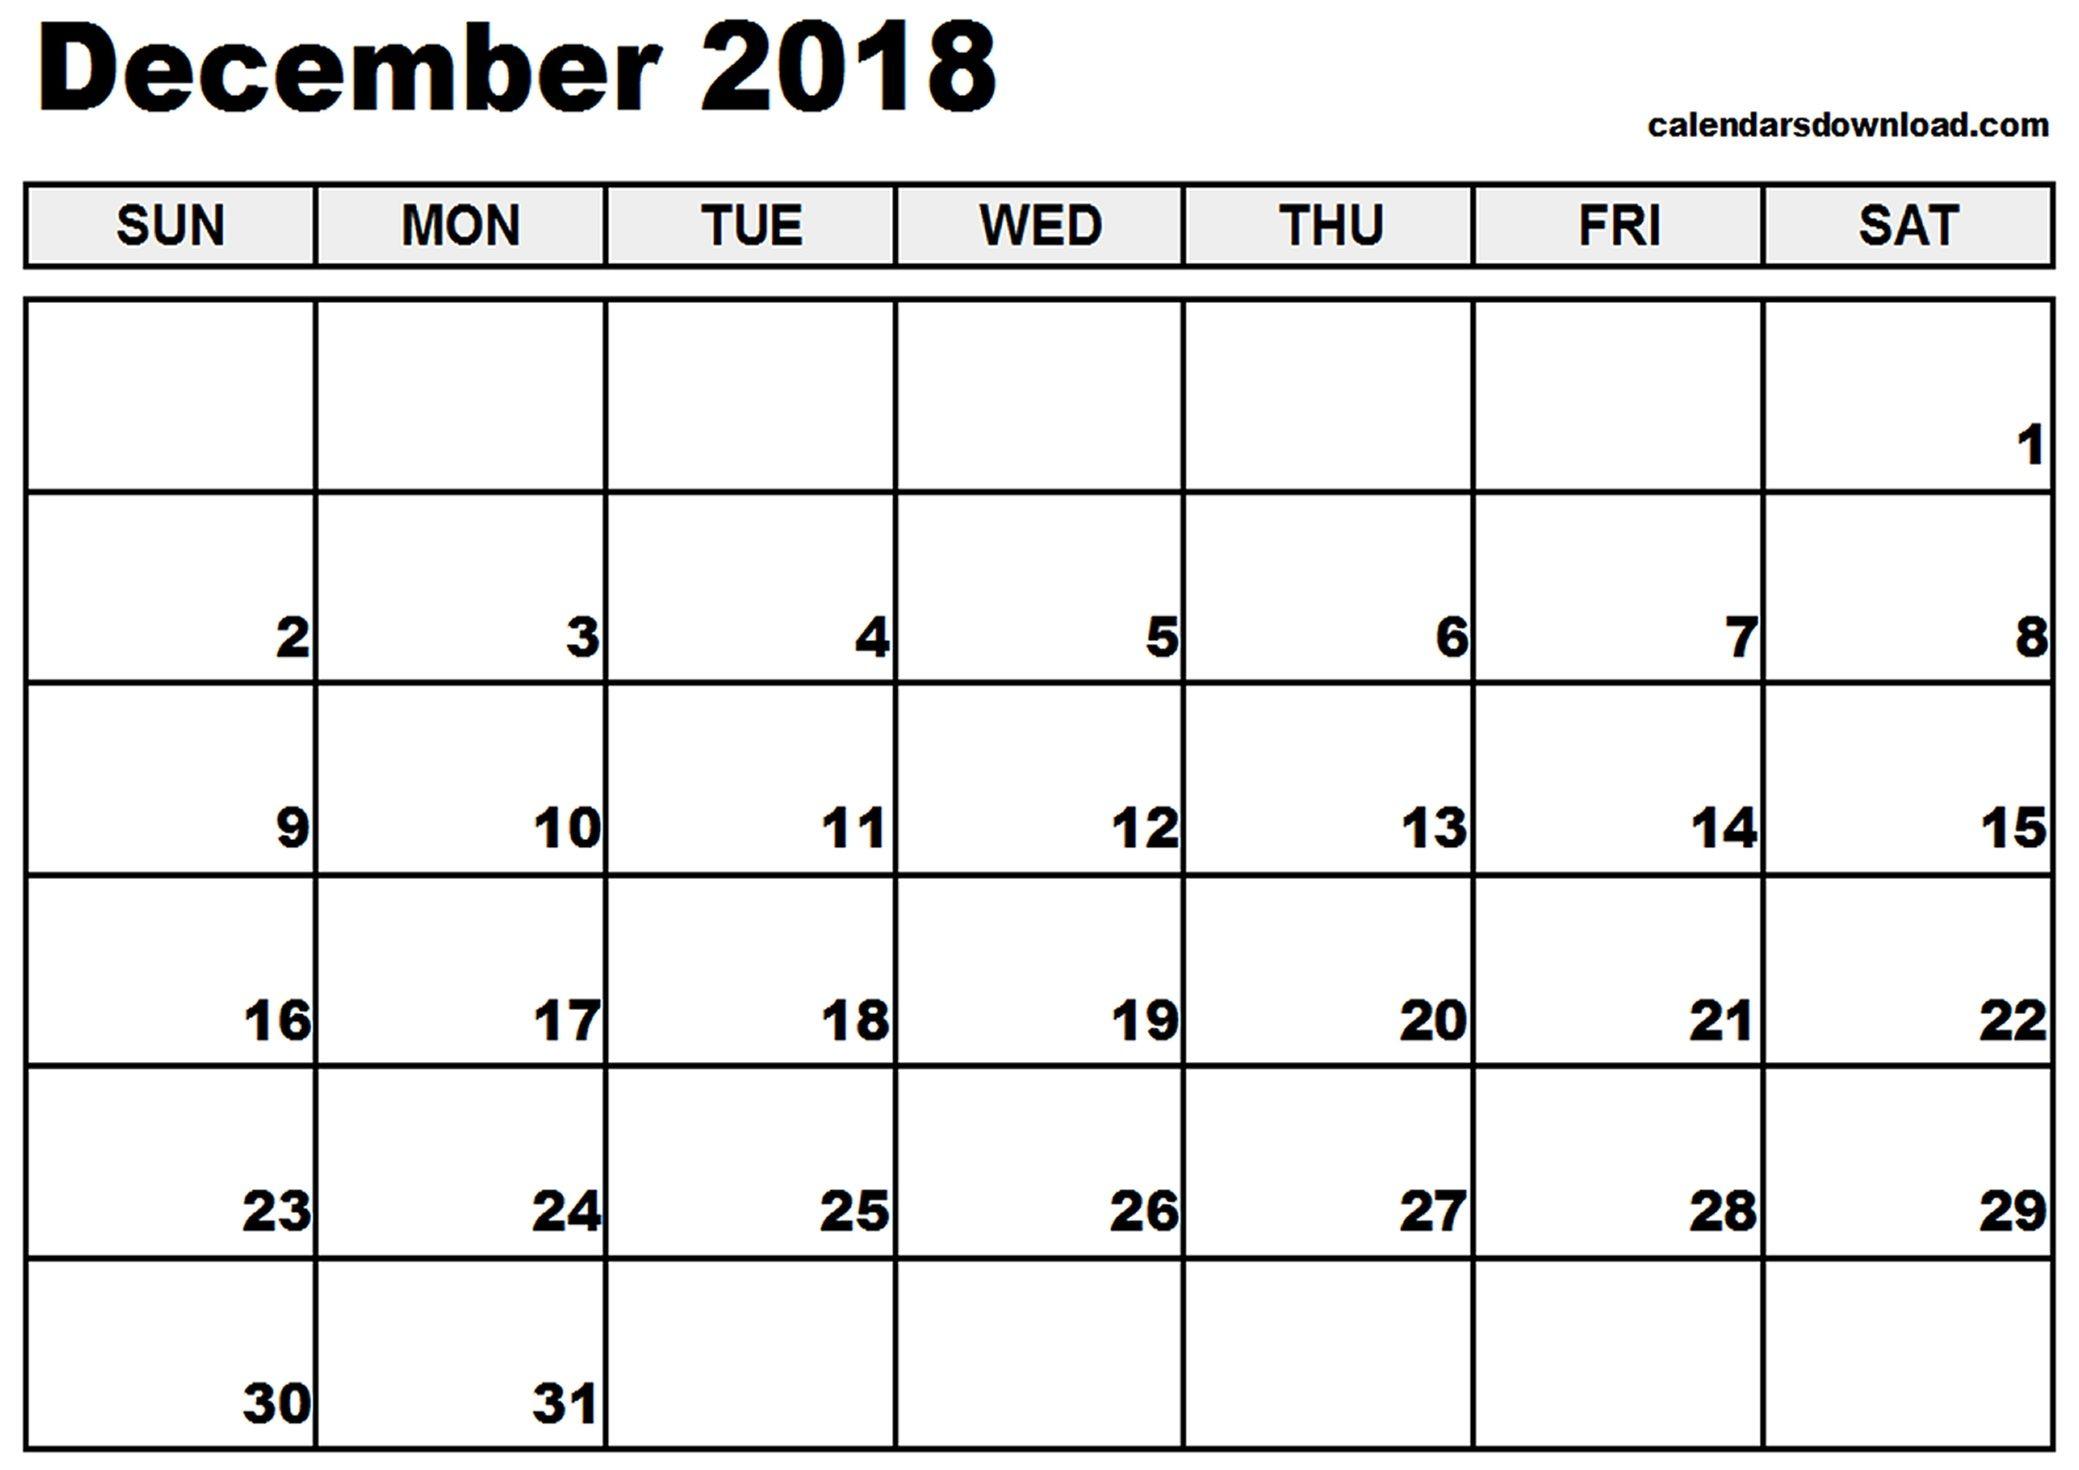 December 2018 Printable Calendar | Printable Calendar Monthly August with August - December Blank Calendar